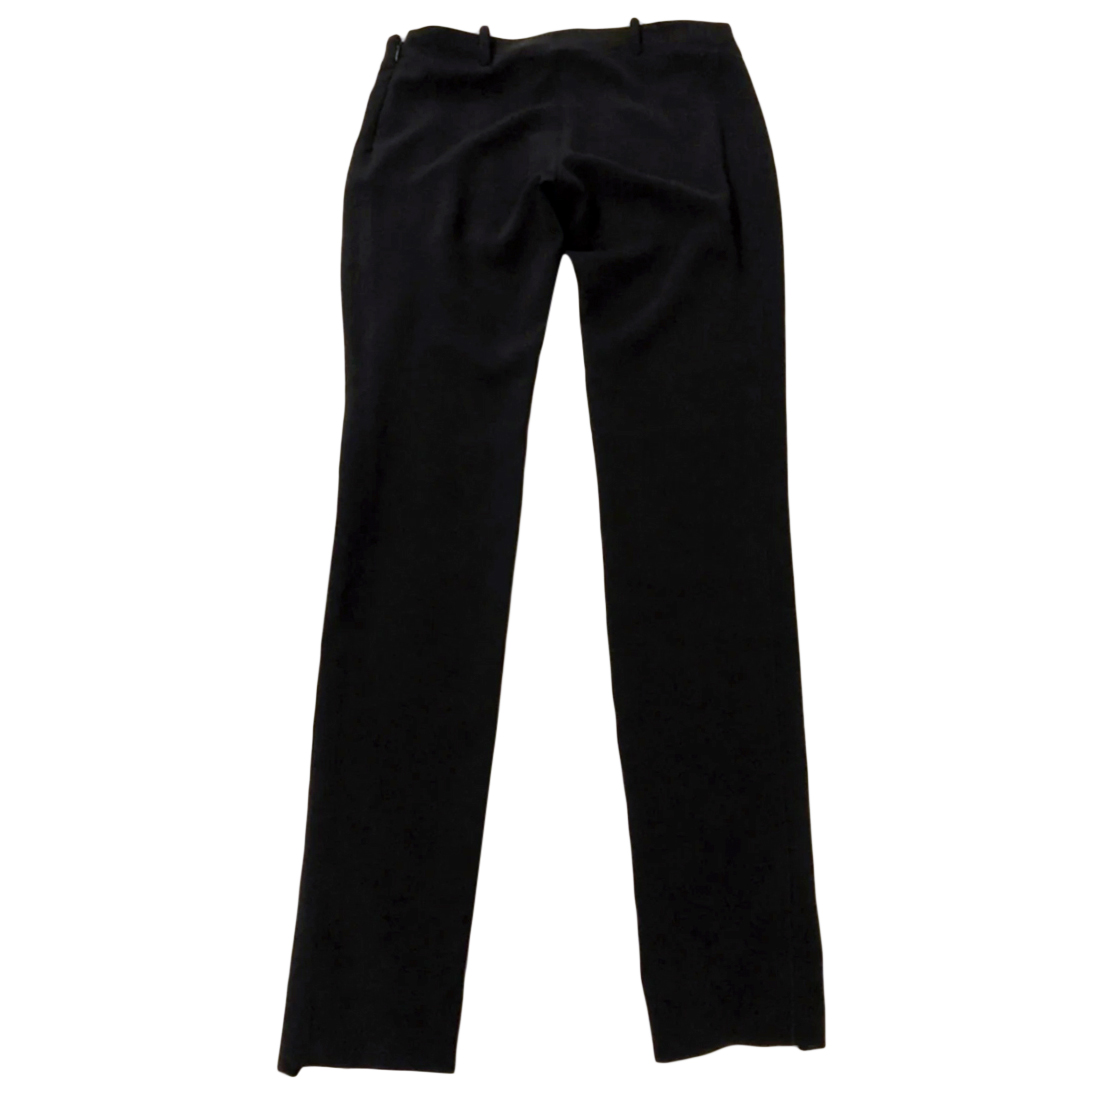 Balenciaga Black Slim Leg Pants